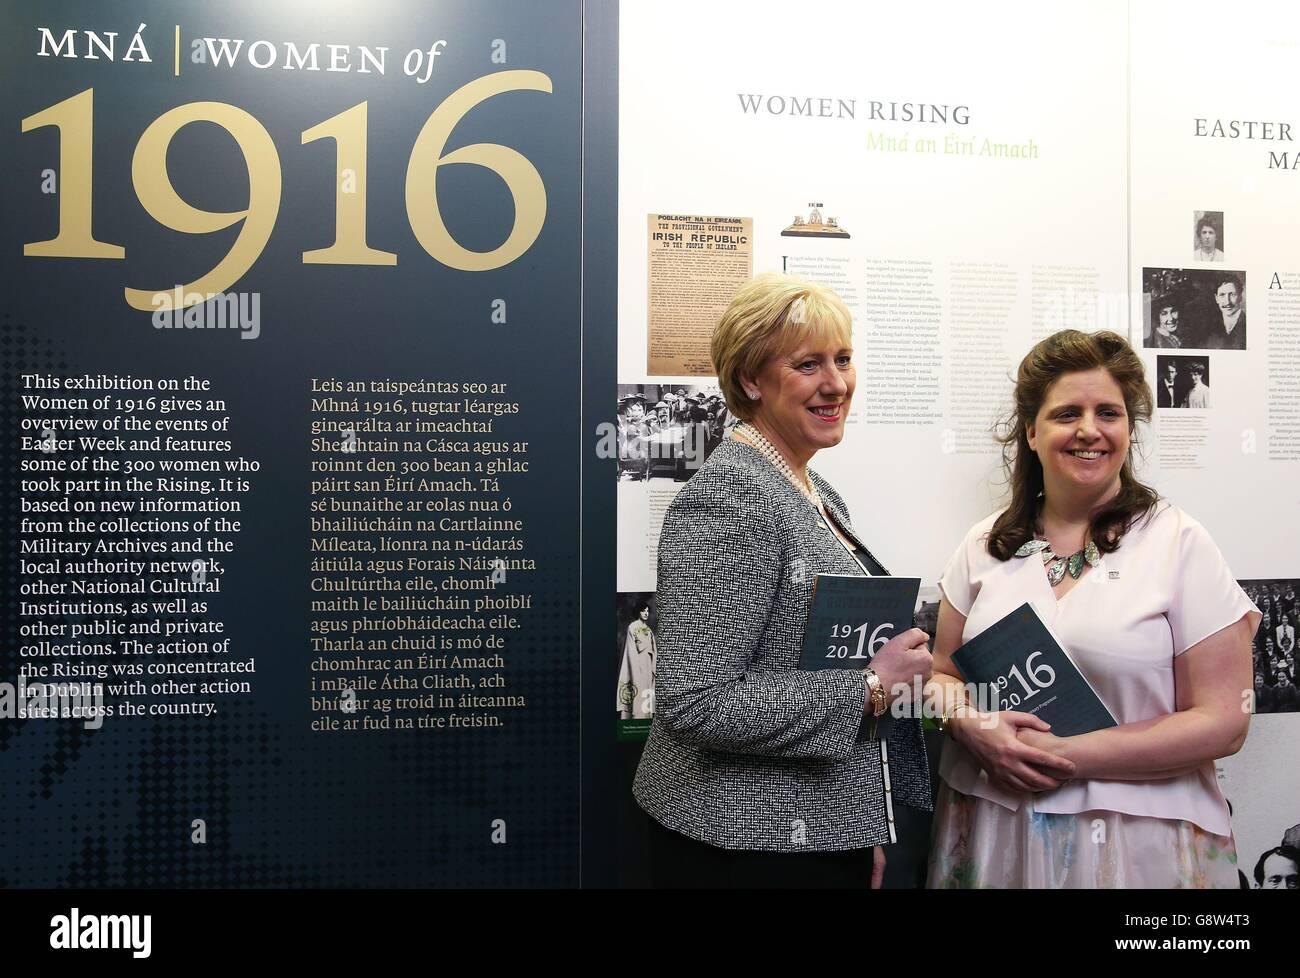 Mna 1916 - Women 1916 opening - Stock Image